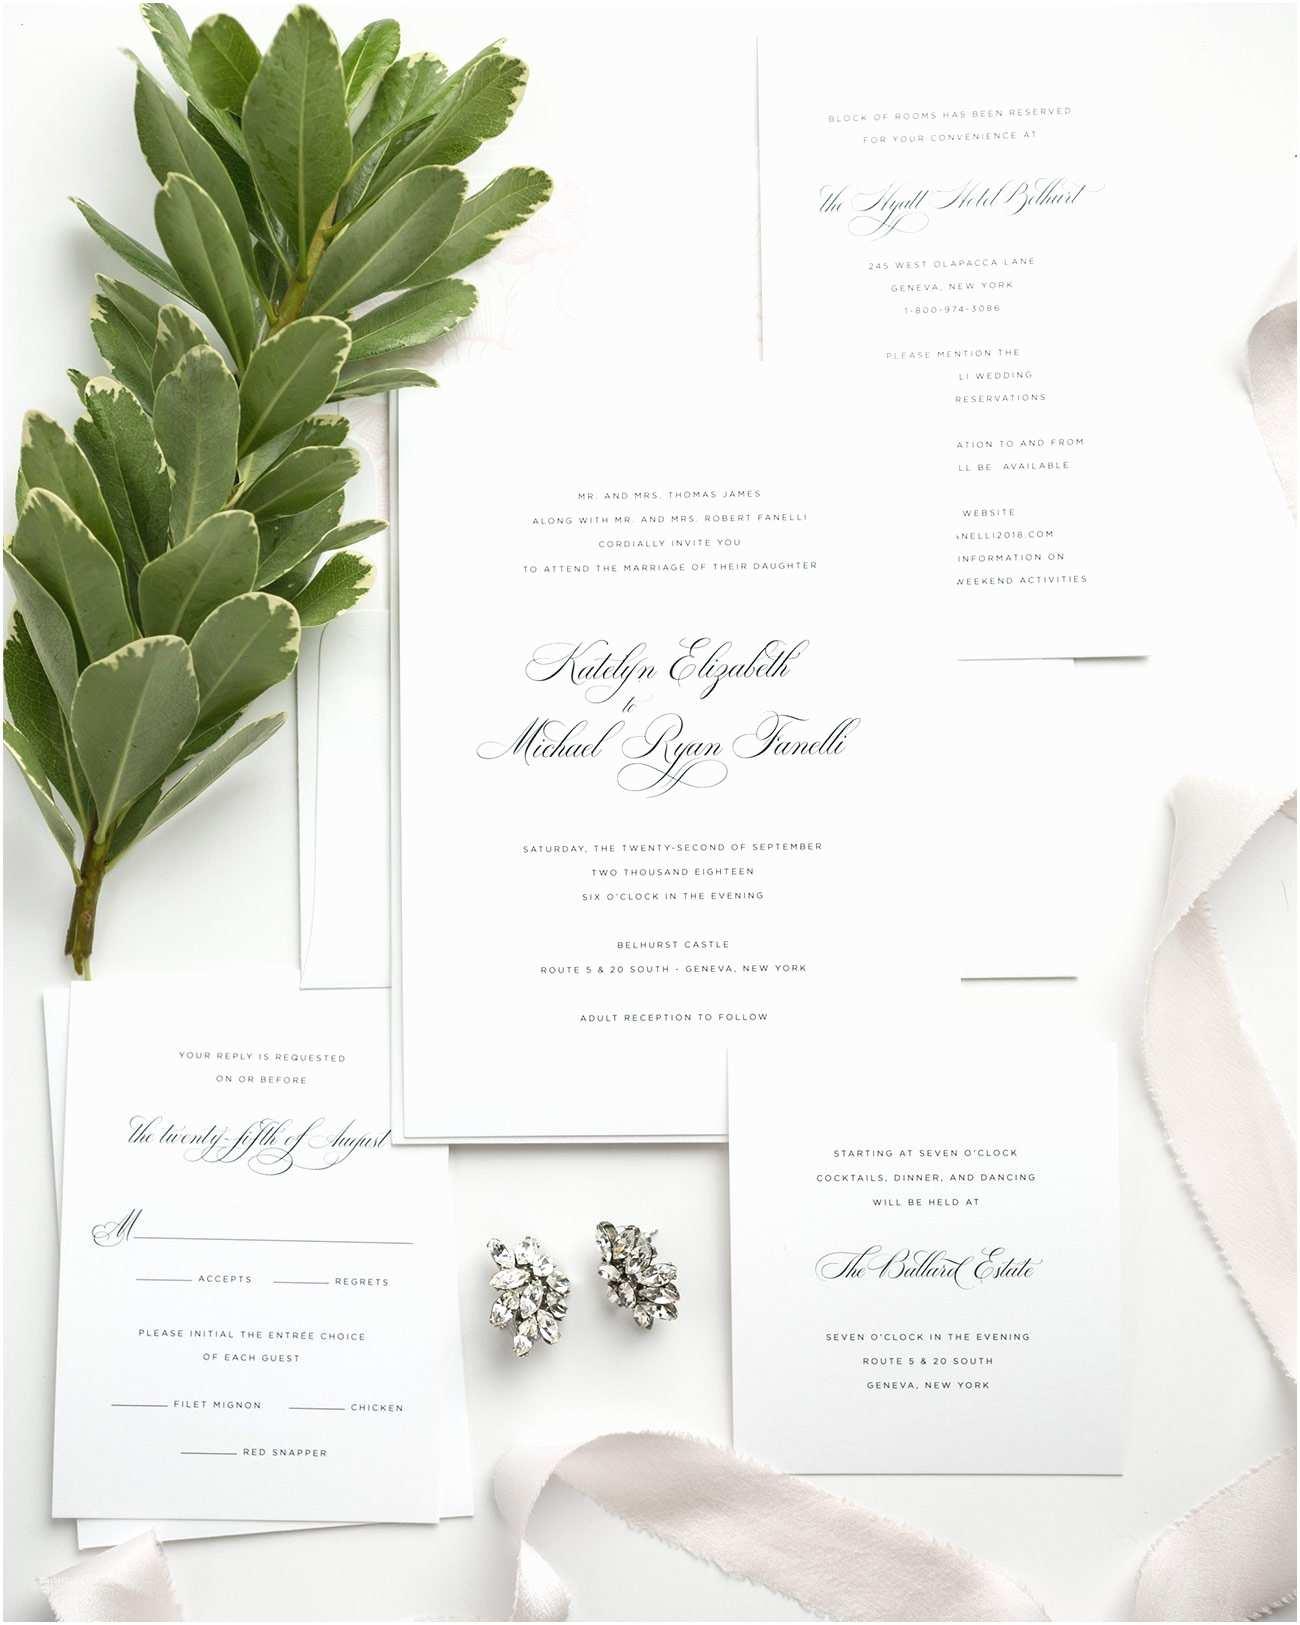 Wedding Invitations Samples Free Wedding Invitation Samples